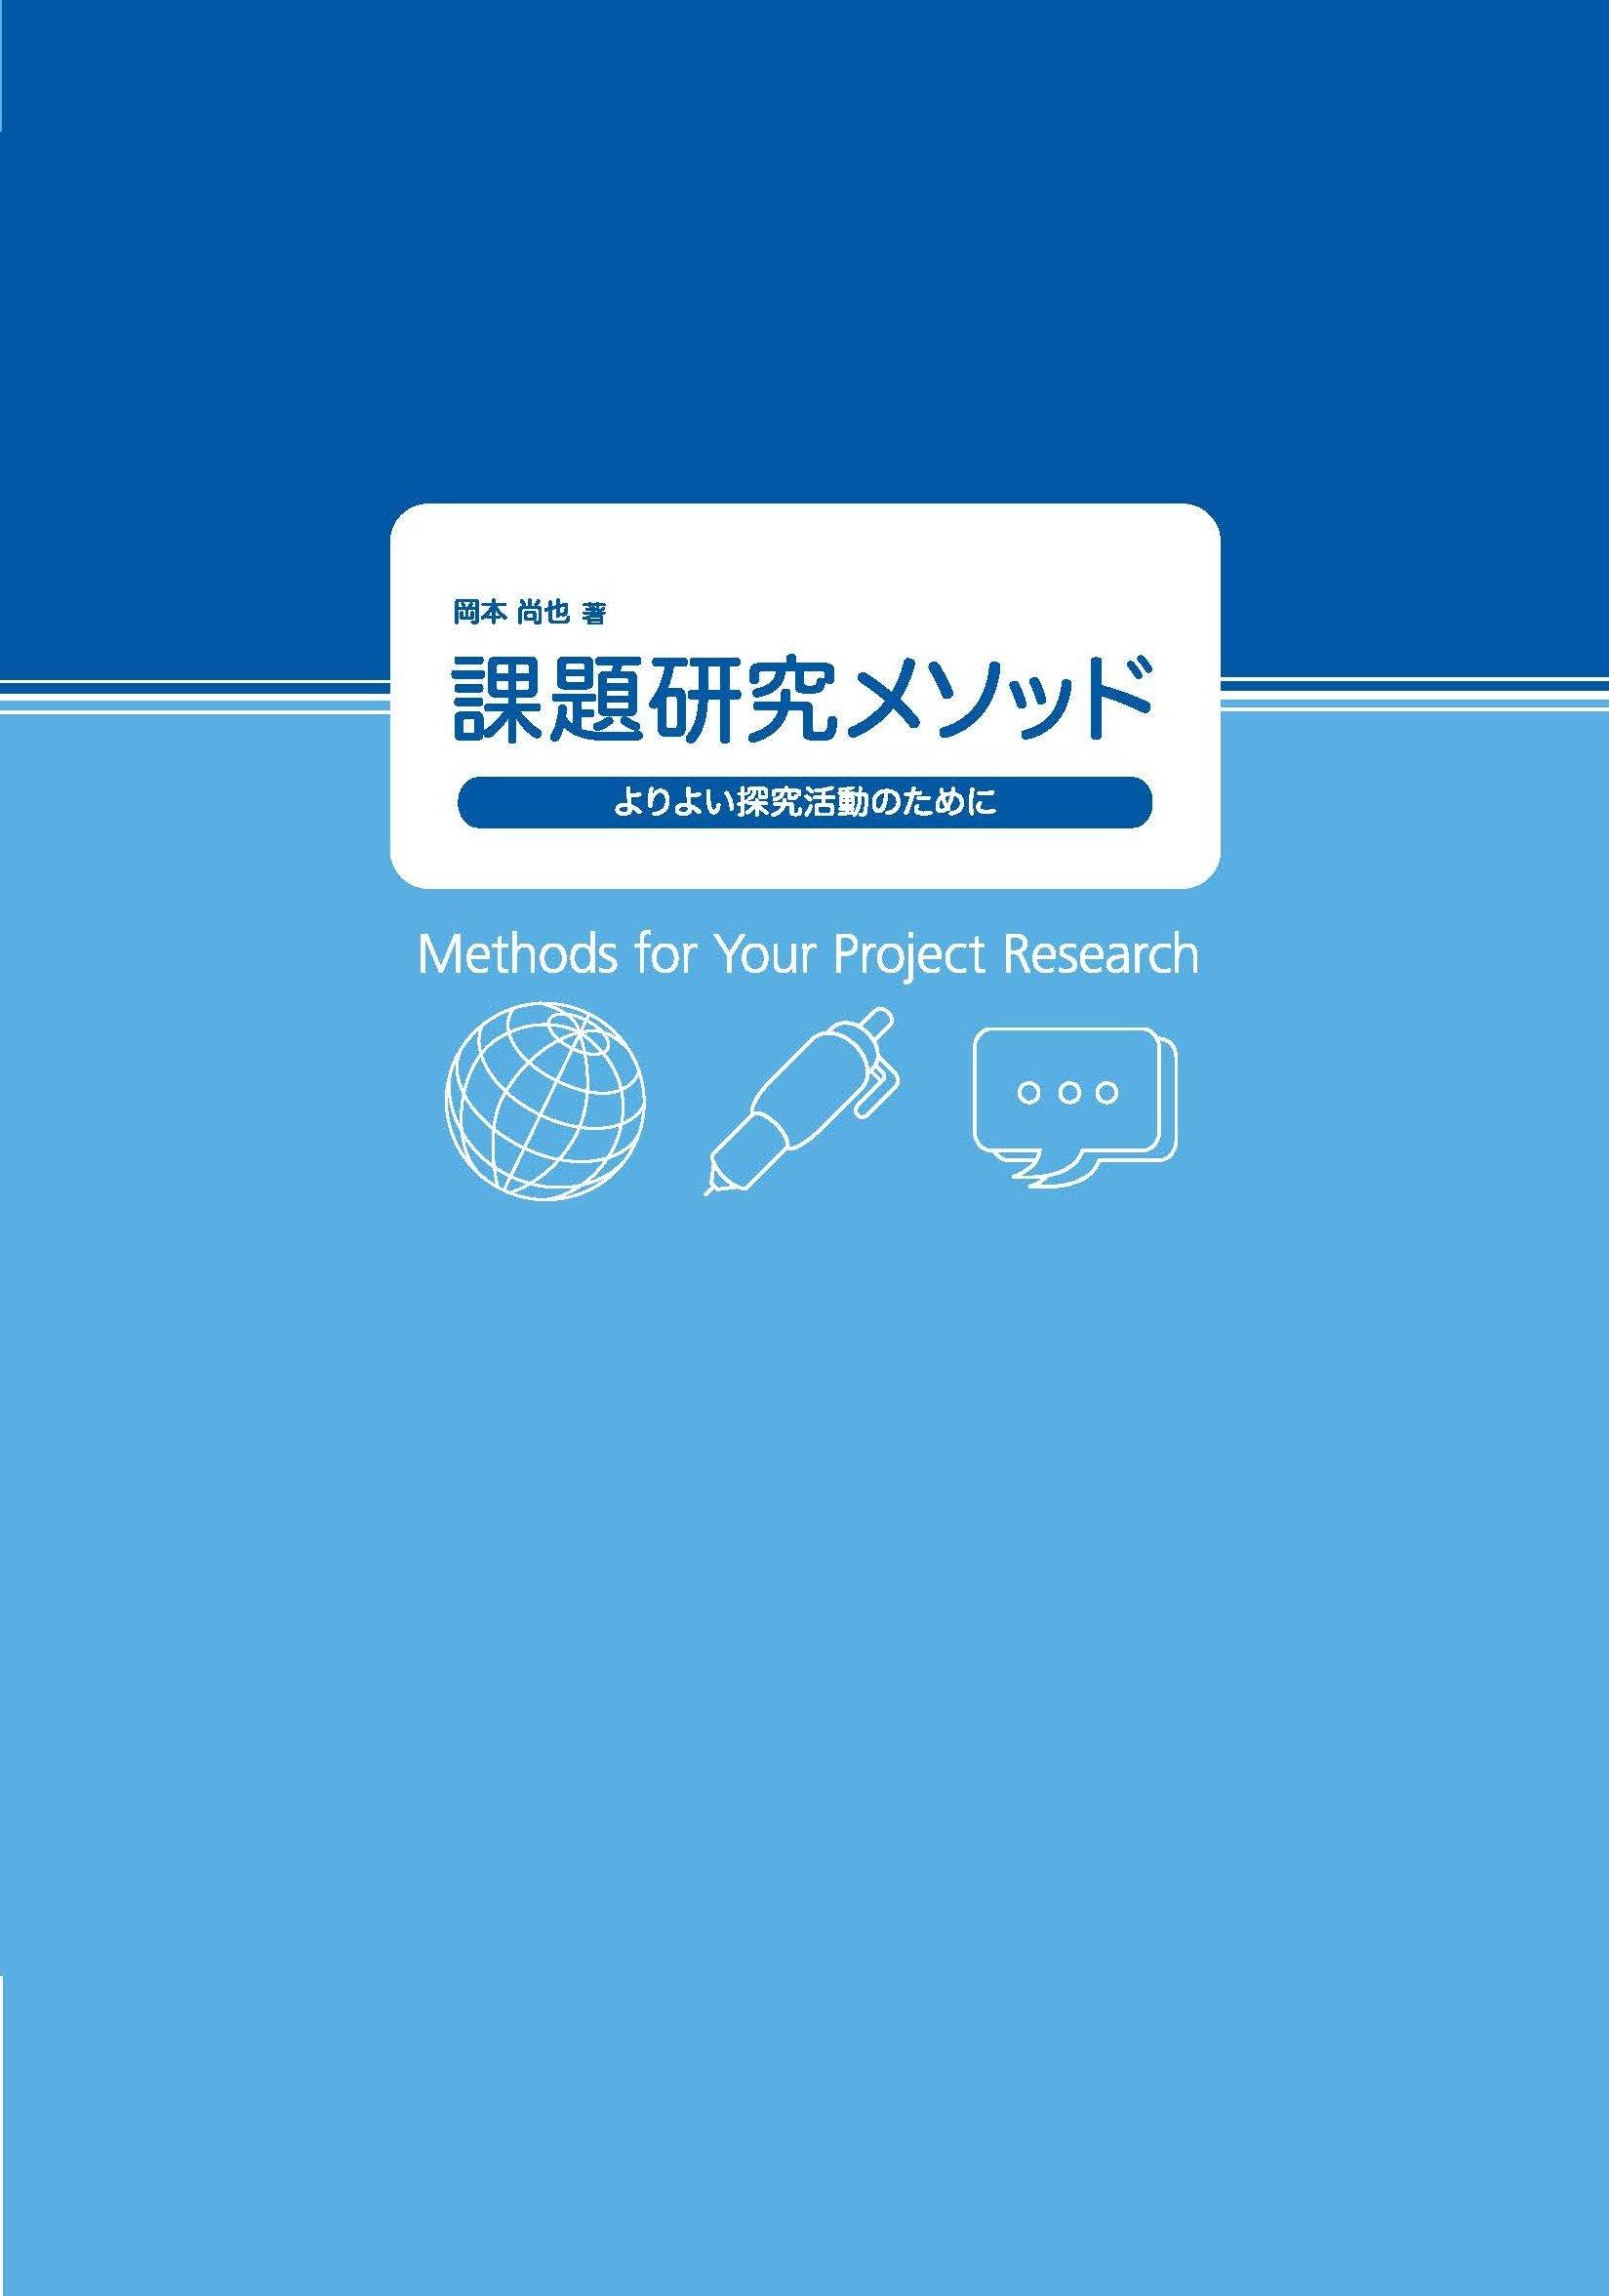 Amazon.co.jp: 課題研究メソッド: 岡本尚也: 本